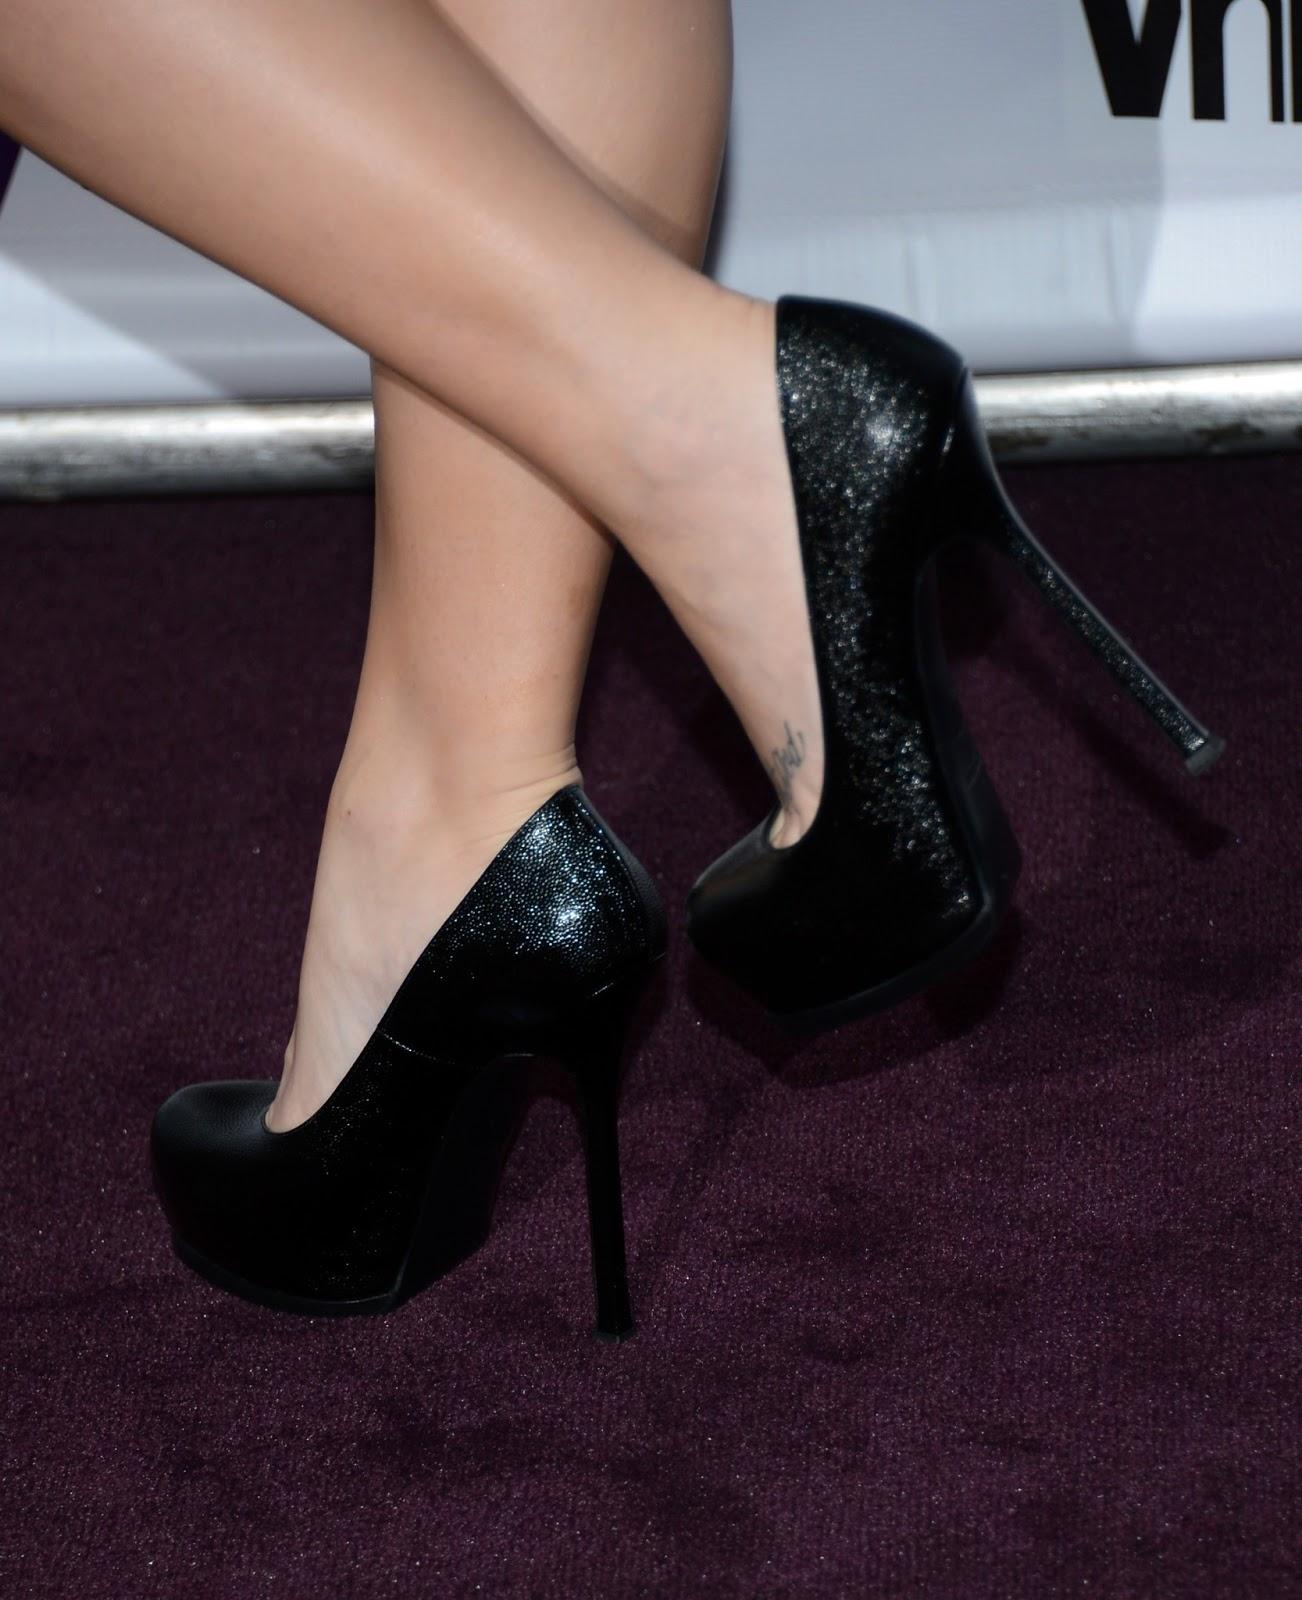 http://3.bp.blogspot.com/-5HhOqT6zfGw/UPxHFns_J9I/AAAAAAAAPzk/AaFb82S8juc/s1600/Demi+Lovato+%252839%2529.JPG